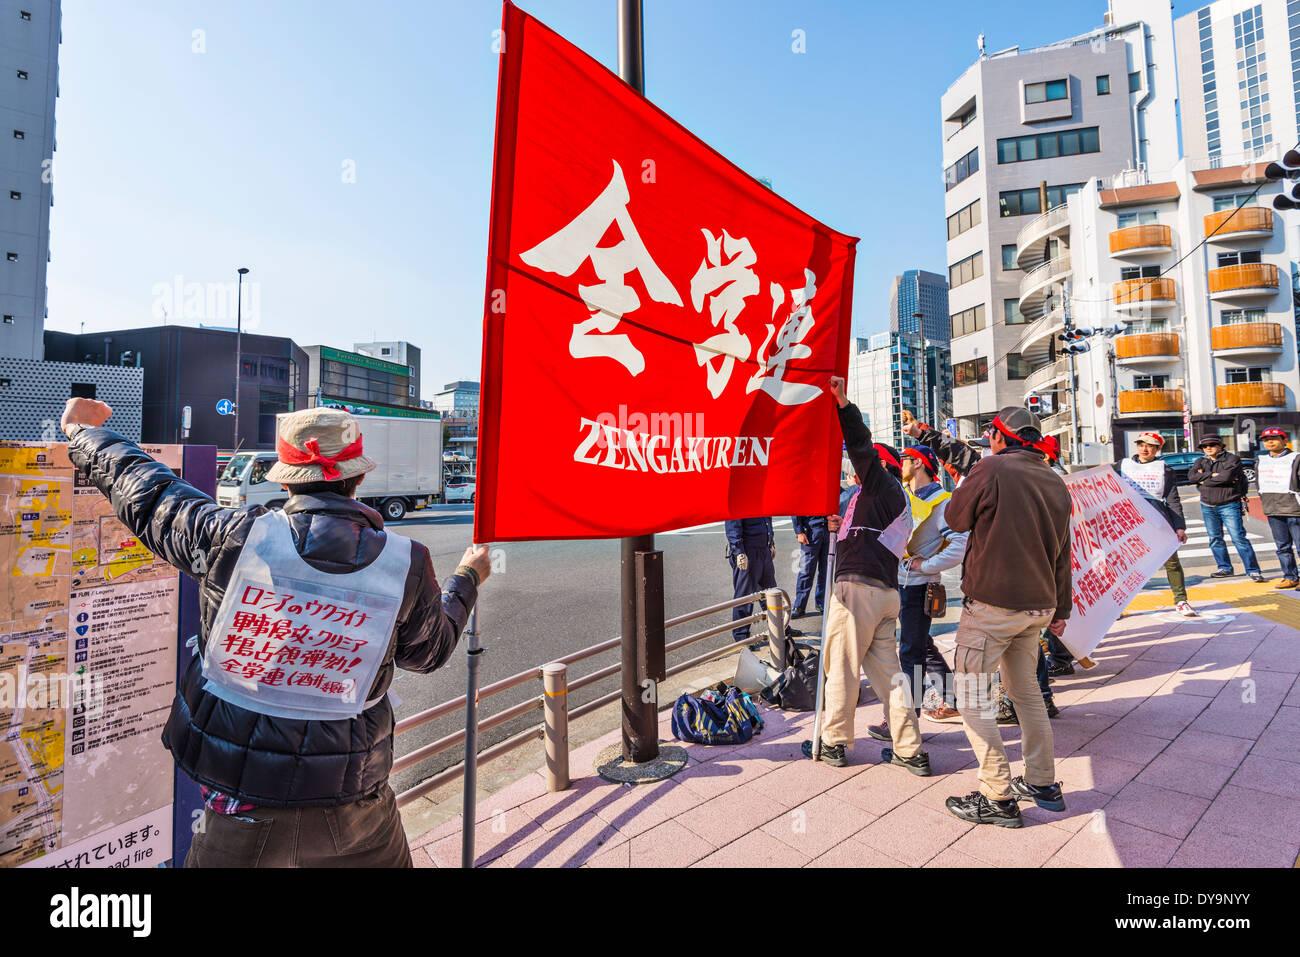 Los miembros Zengakuren protestar contra la anexión de Crimea por Rusia en Tokio, Japón. Imagen De Stock